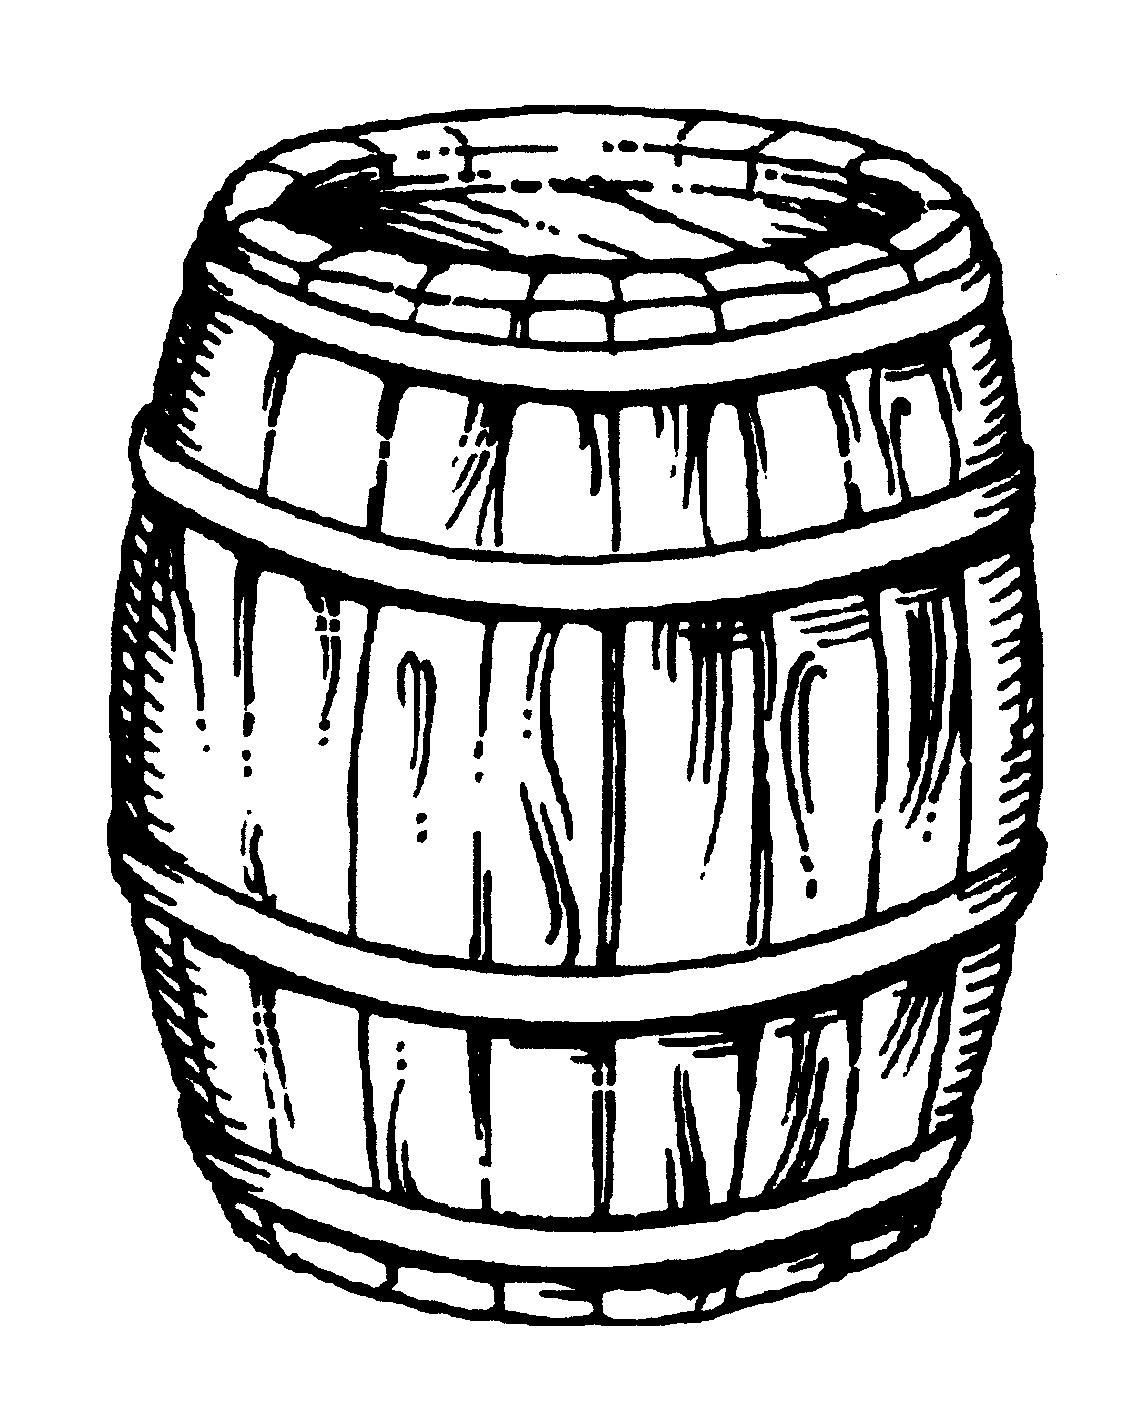 Wooden Barrel Drawing At Getdrawings